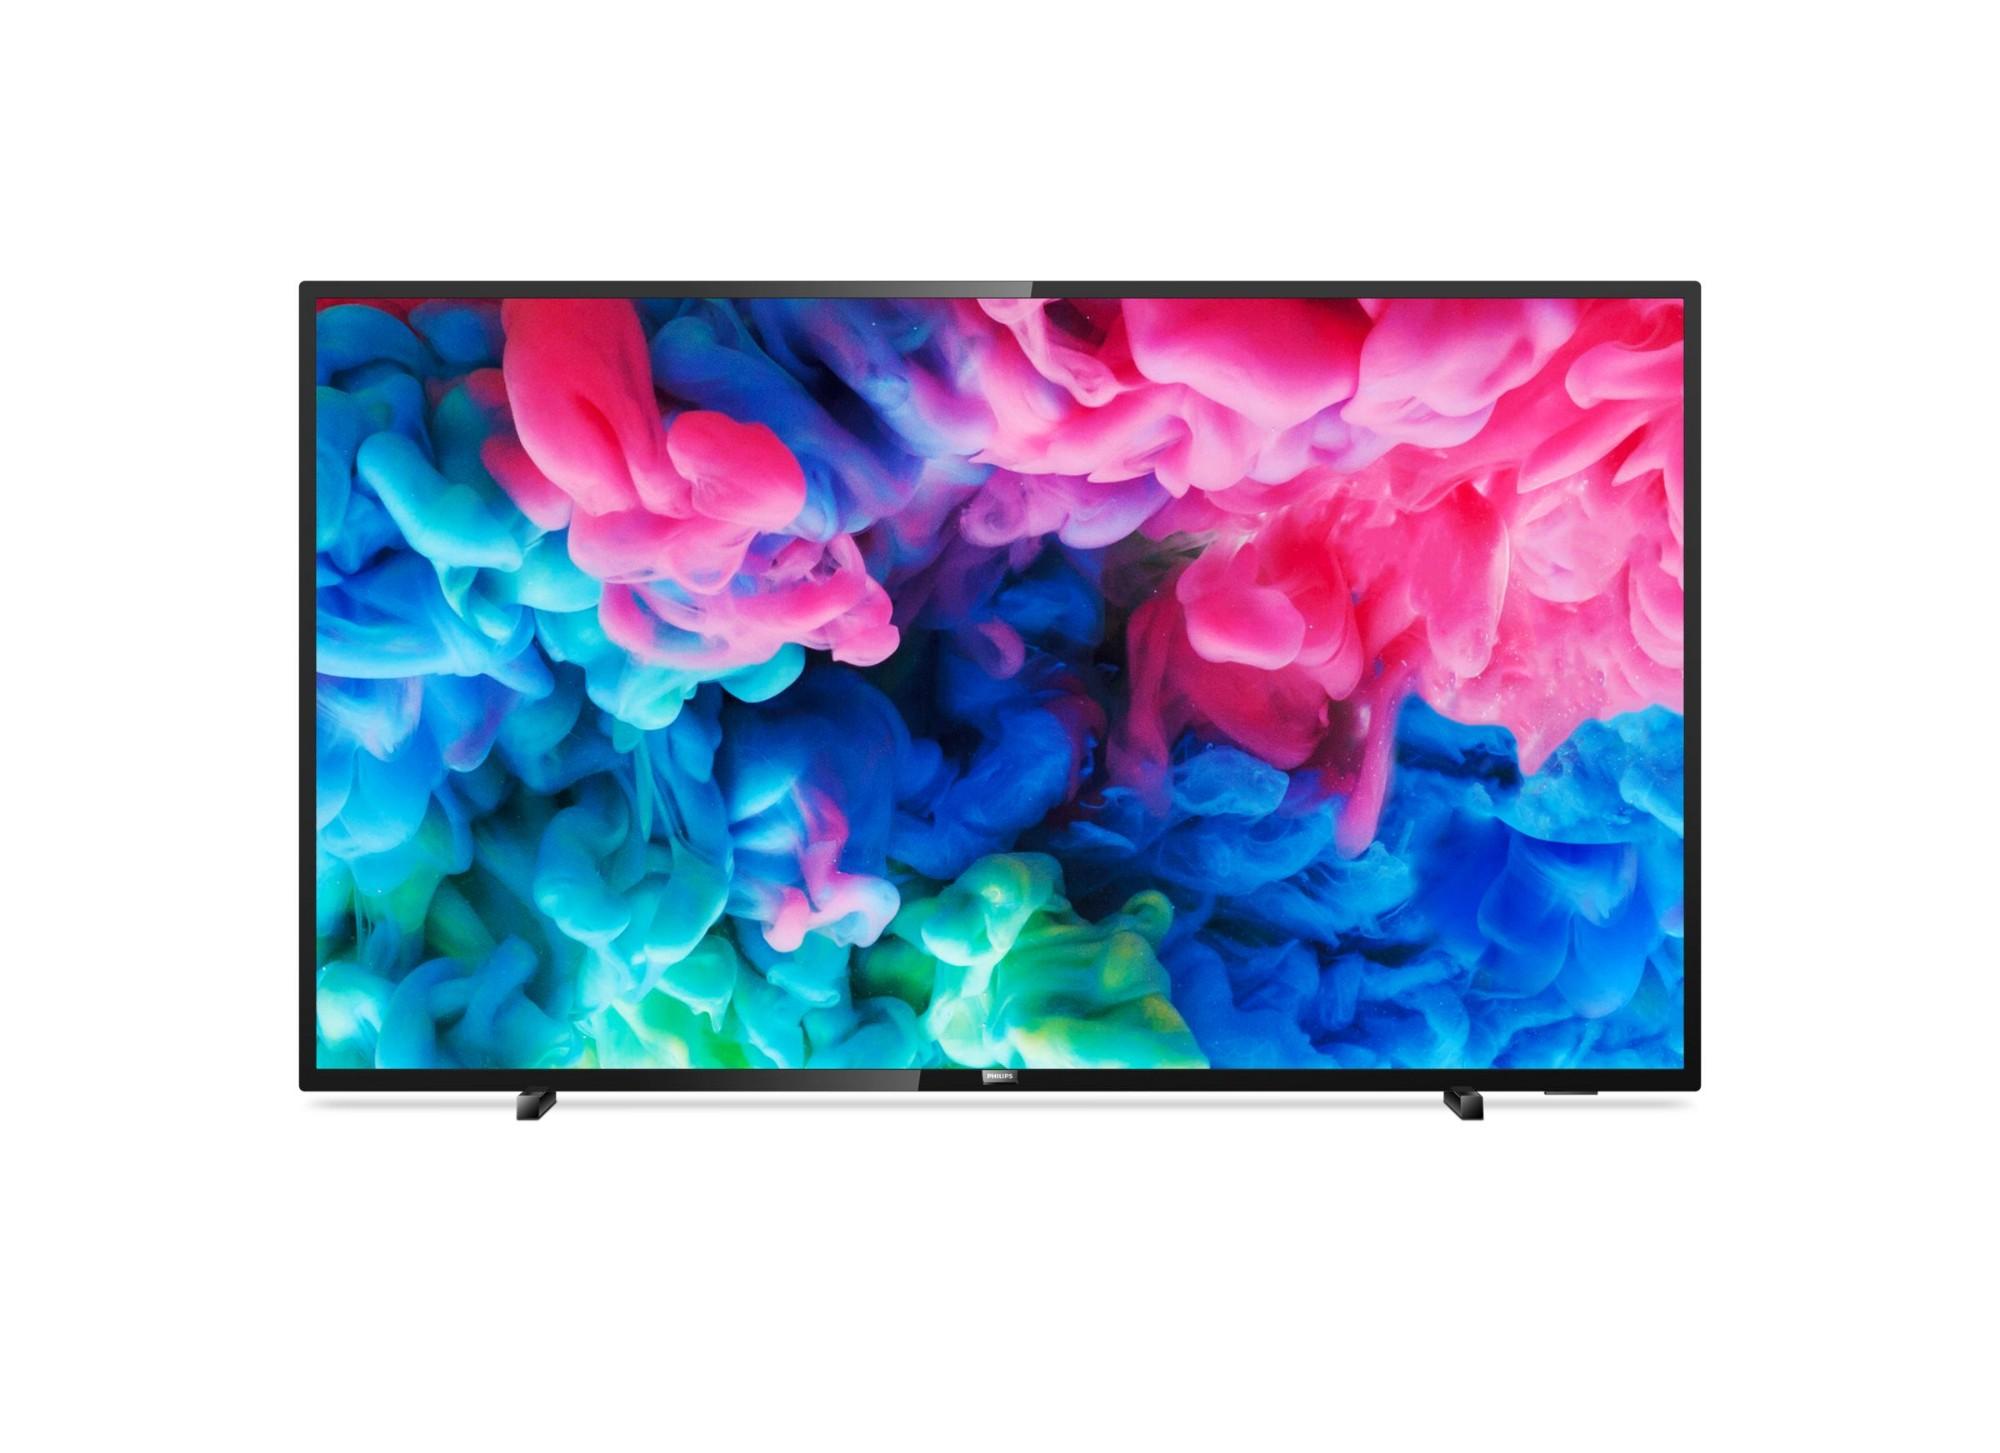 "Philips 6500 series 50PUS6503/12 Refurb Grade A+ LED TV 127 cm (50"") 4K Ultra HD Smart TV Wi-Fi Black"